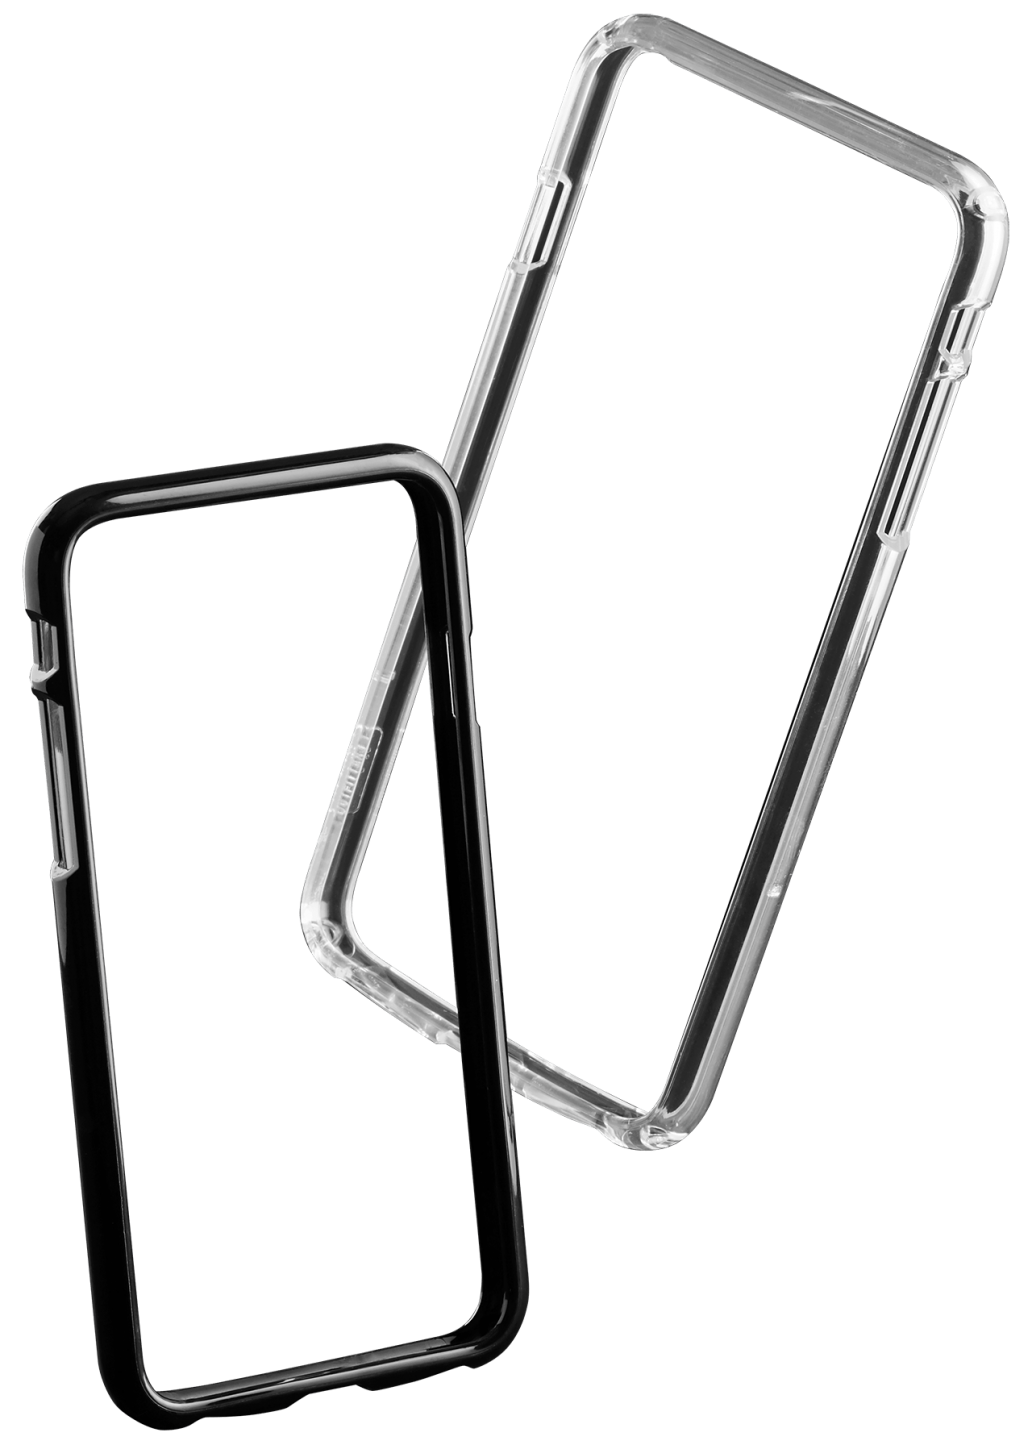 fusion-bumper-nera-trasparente-cover-uai-1032x1445